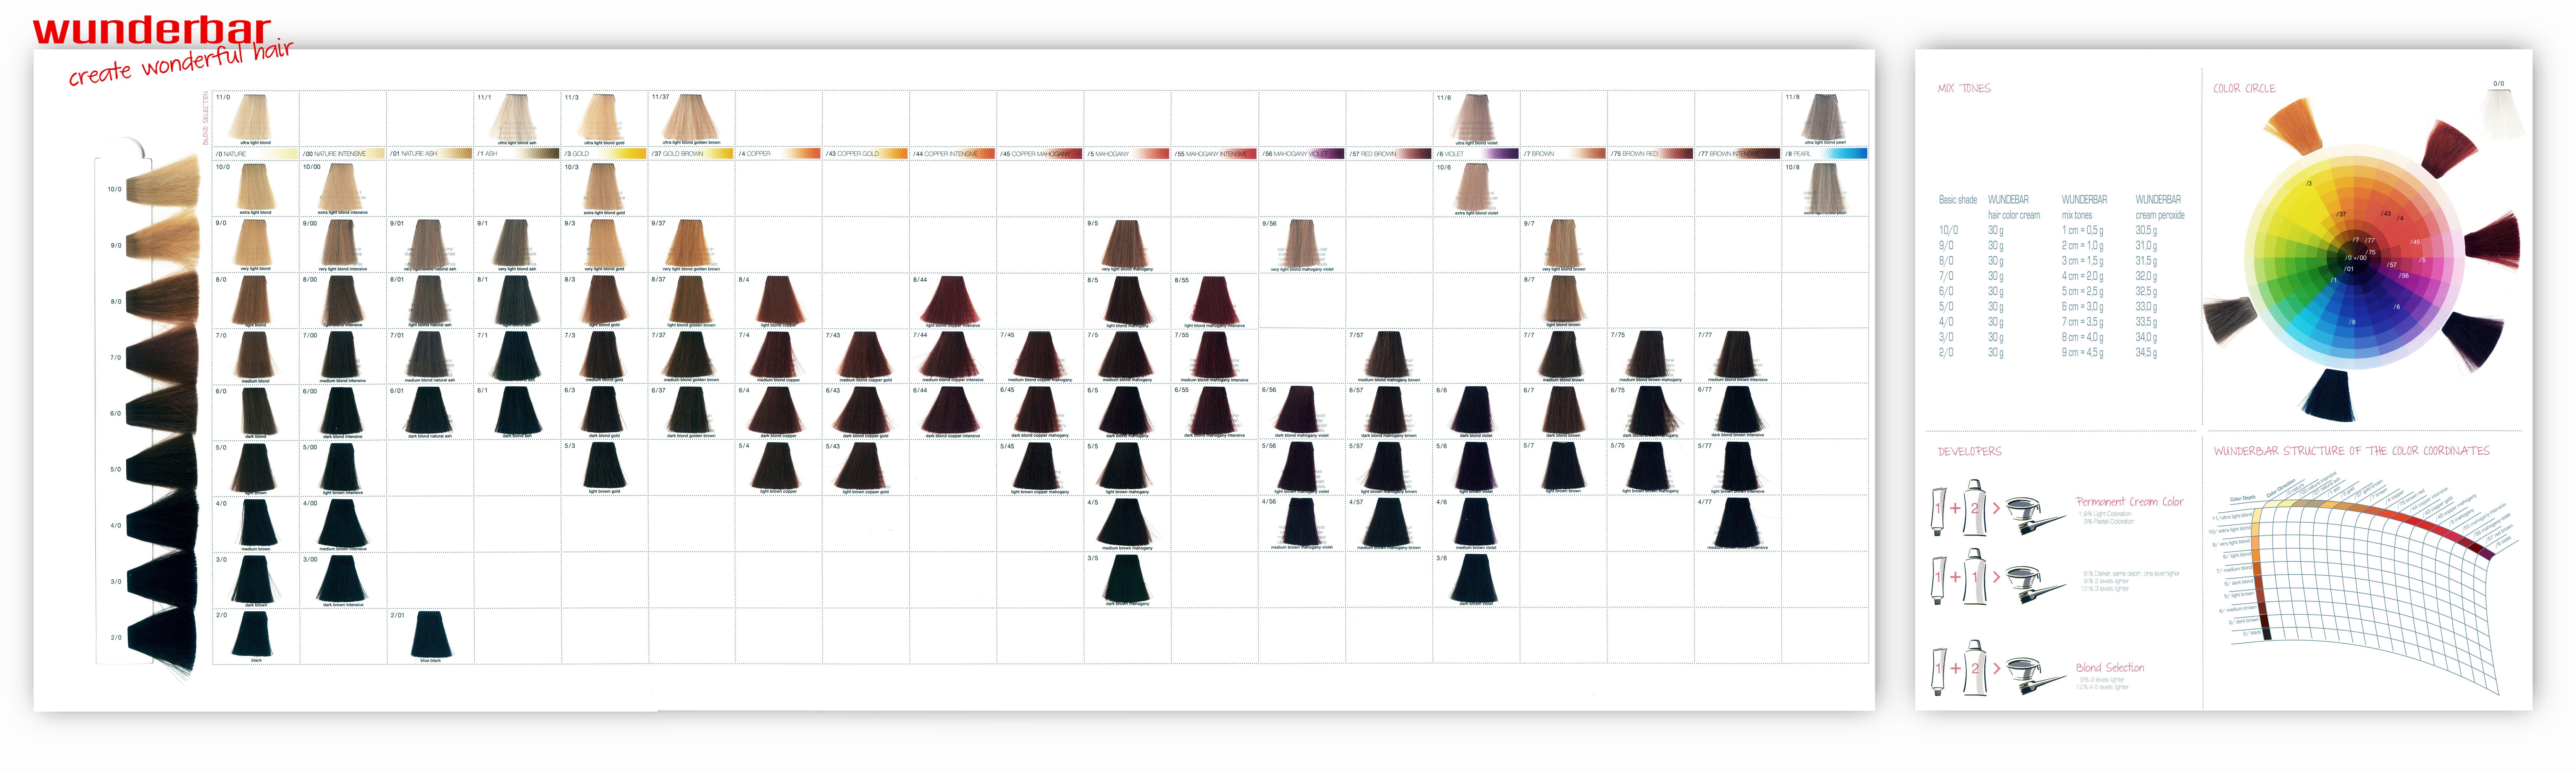 Wunderbar hair color cream color chart color charts pinterest wunderbar hair color cream color chart geenschuldenfo Gallery